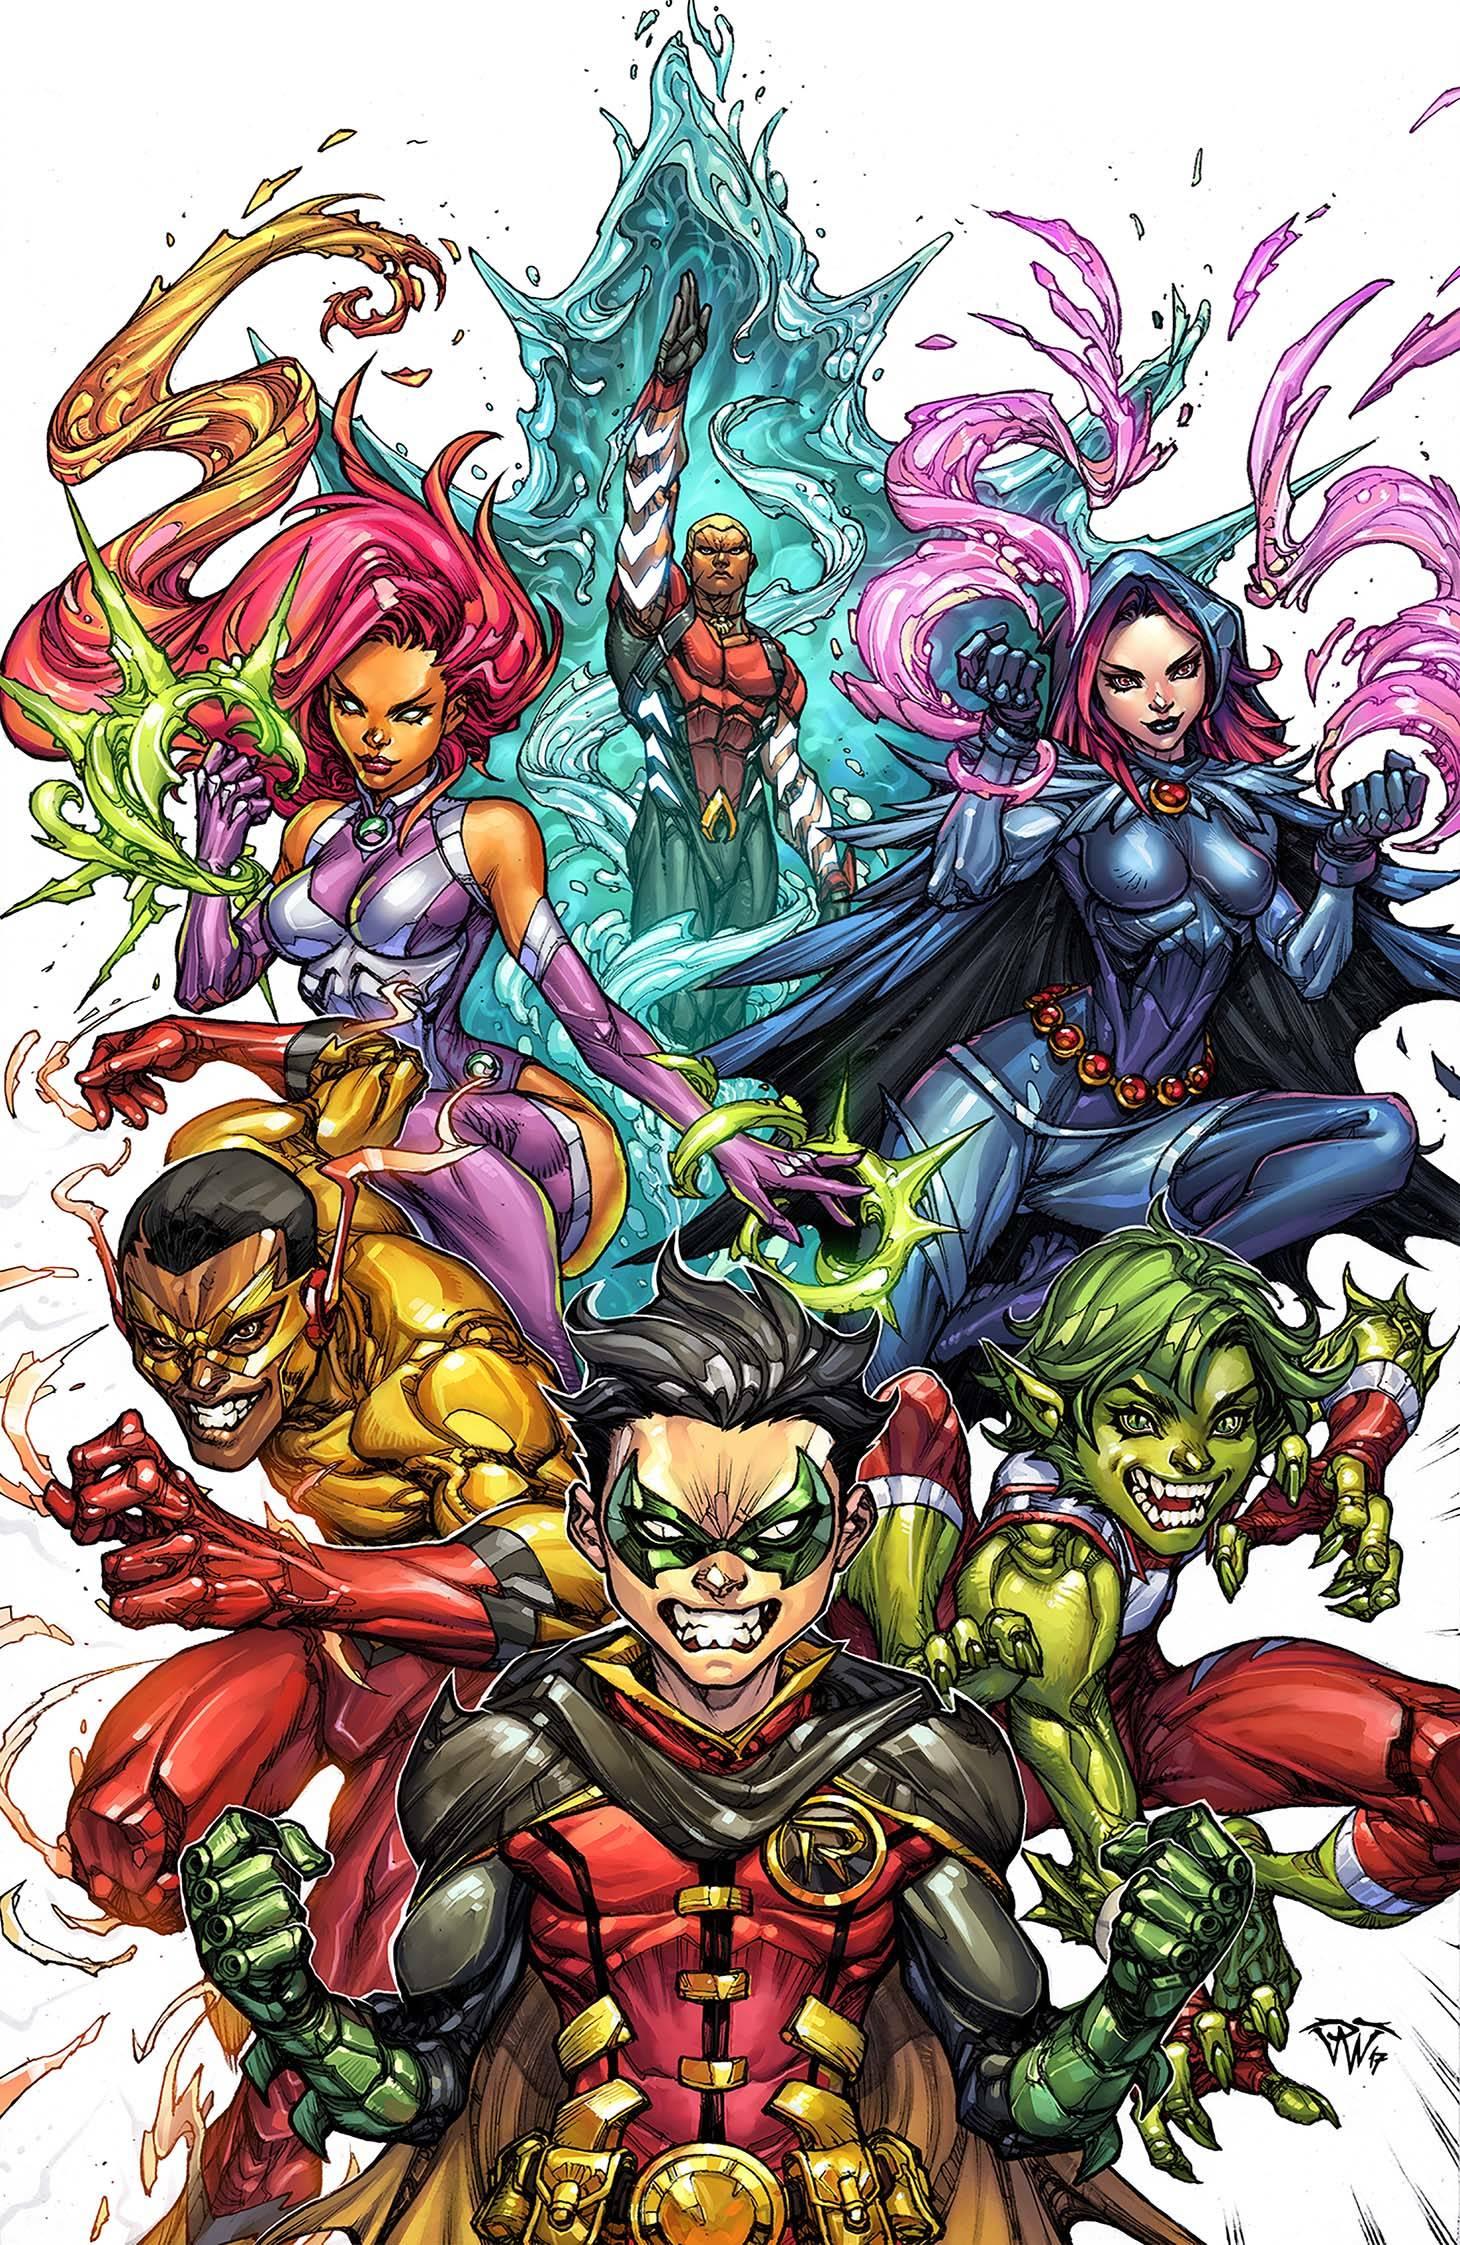 Teen Titans Vol 6 10 Textless Variant.jpg